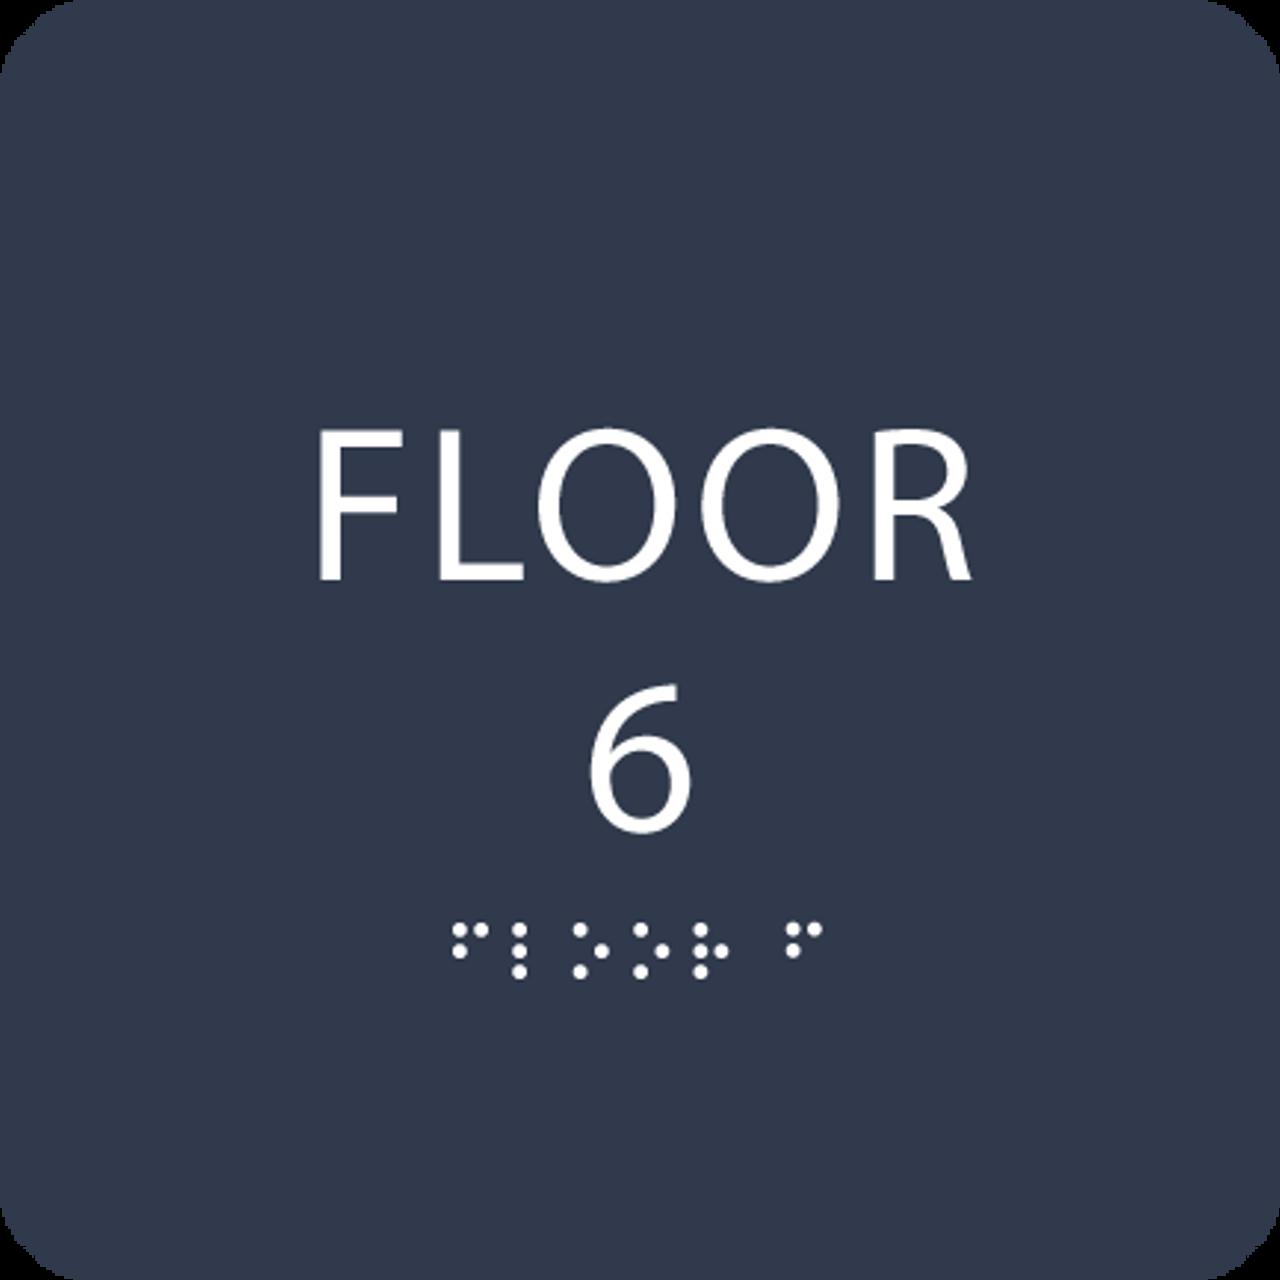 Navy Floor 6 Level Identification ADA Sign